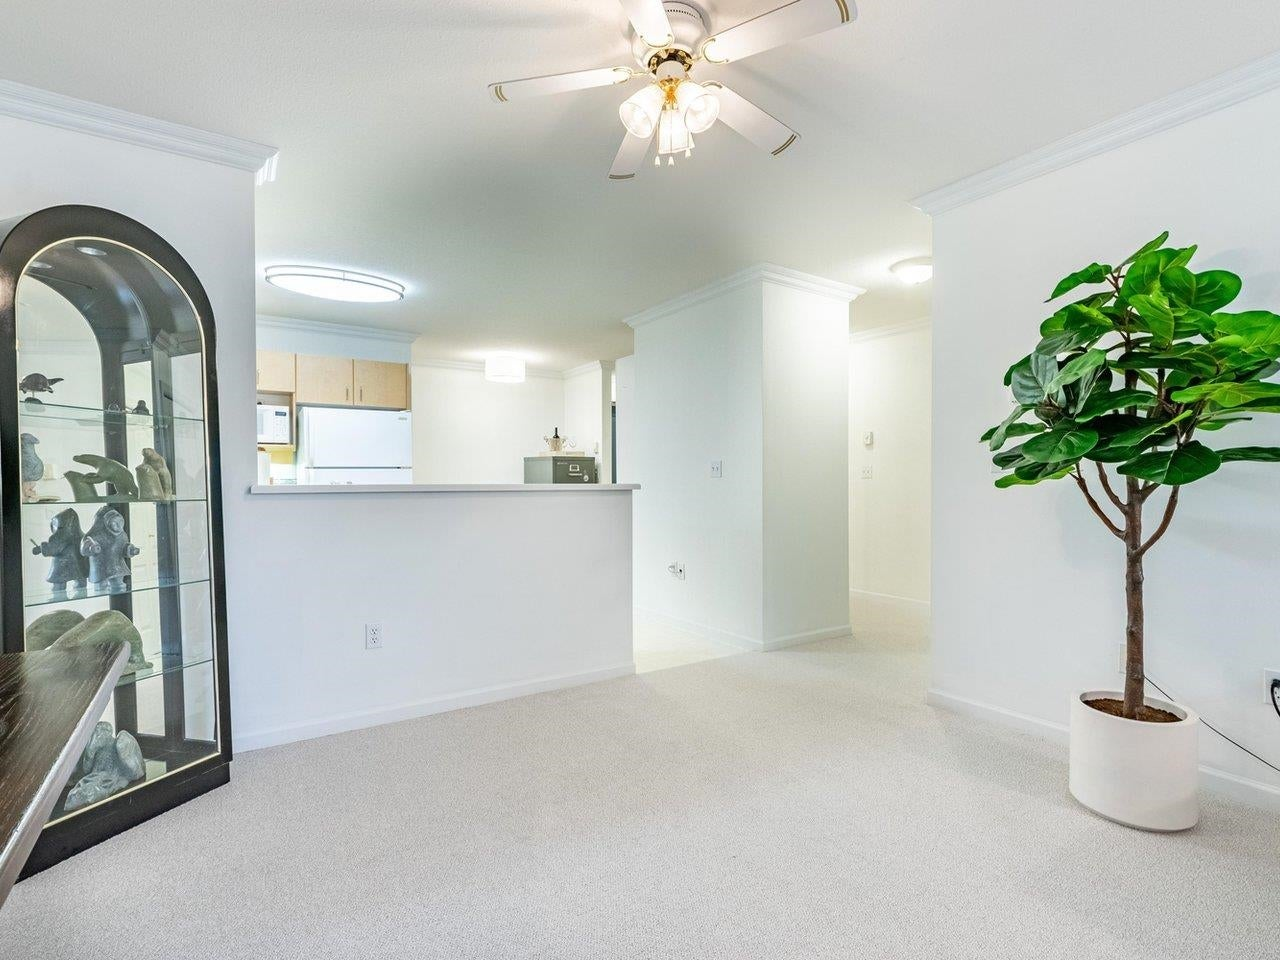 306 15298 20 AVENUE - King George Corridor Apartment/Condo for sale, 2 Bedrooms (R2625551) - #12